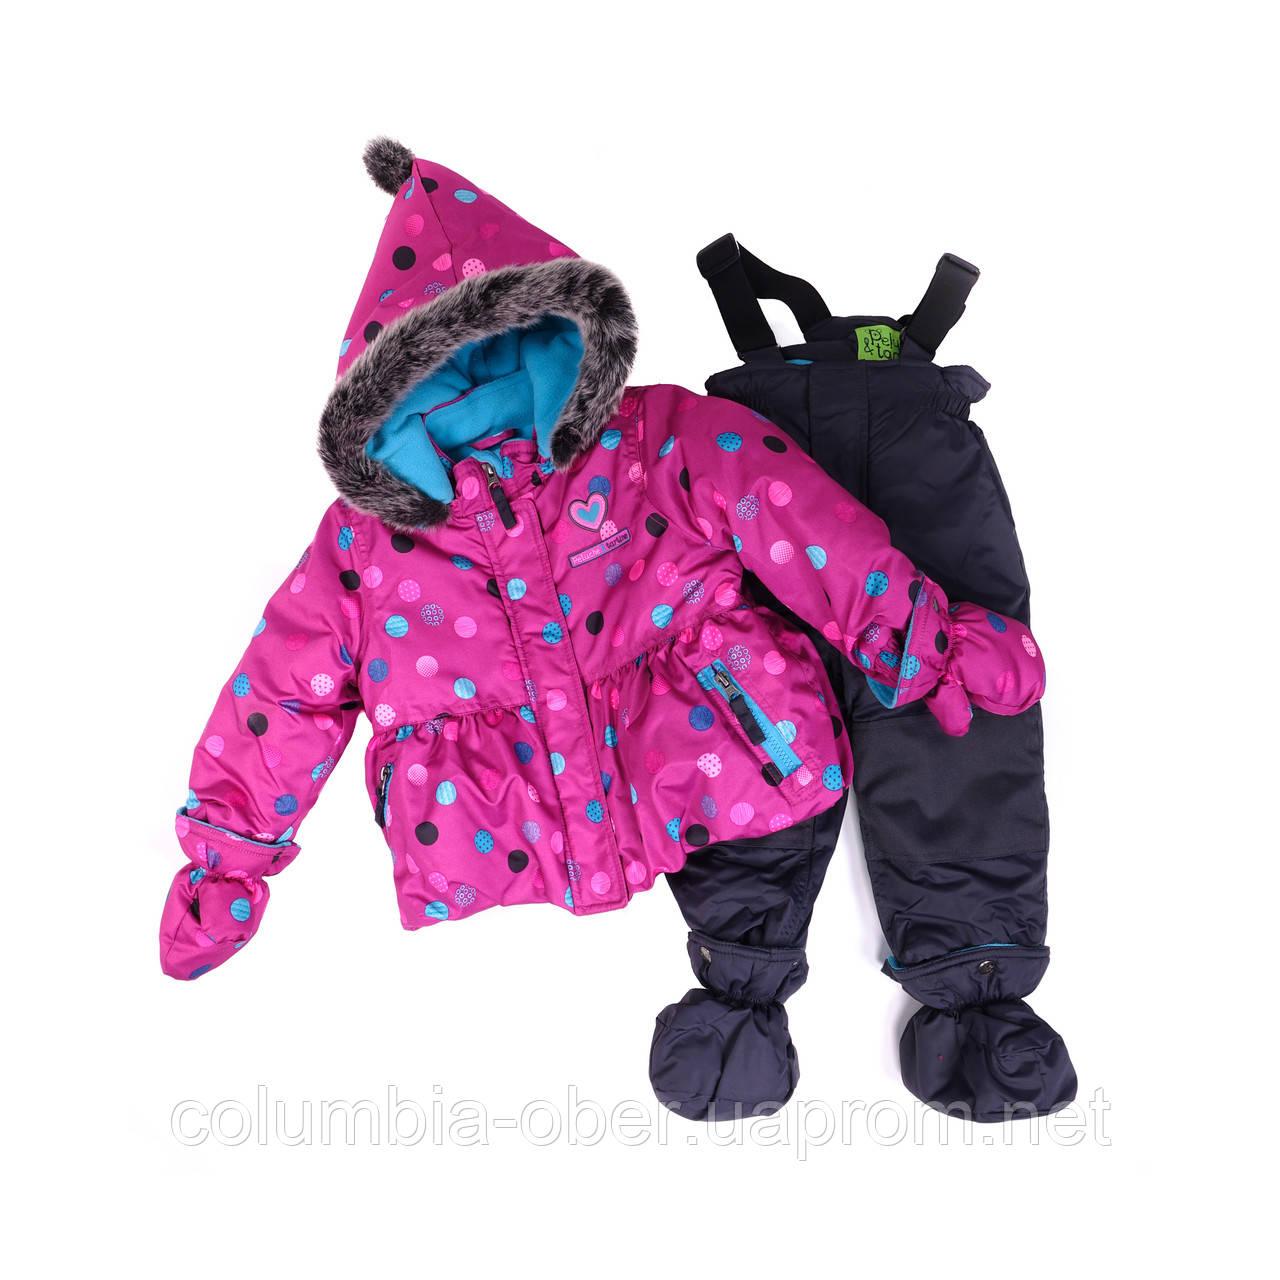 Зимний костюм для девочки PELUCHE 32 BF M F16 Paradisio. Размеры 82 - 97.